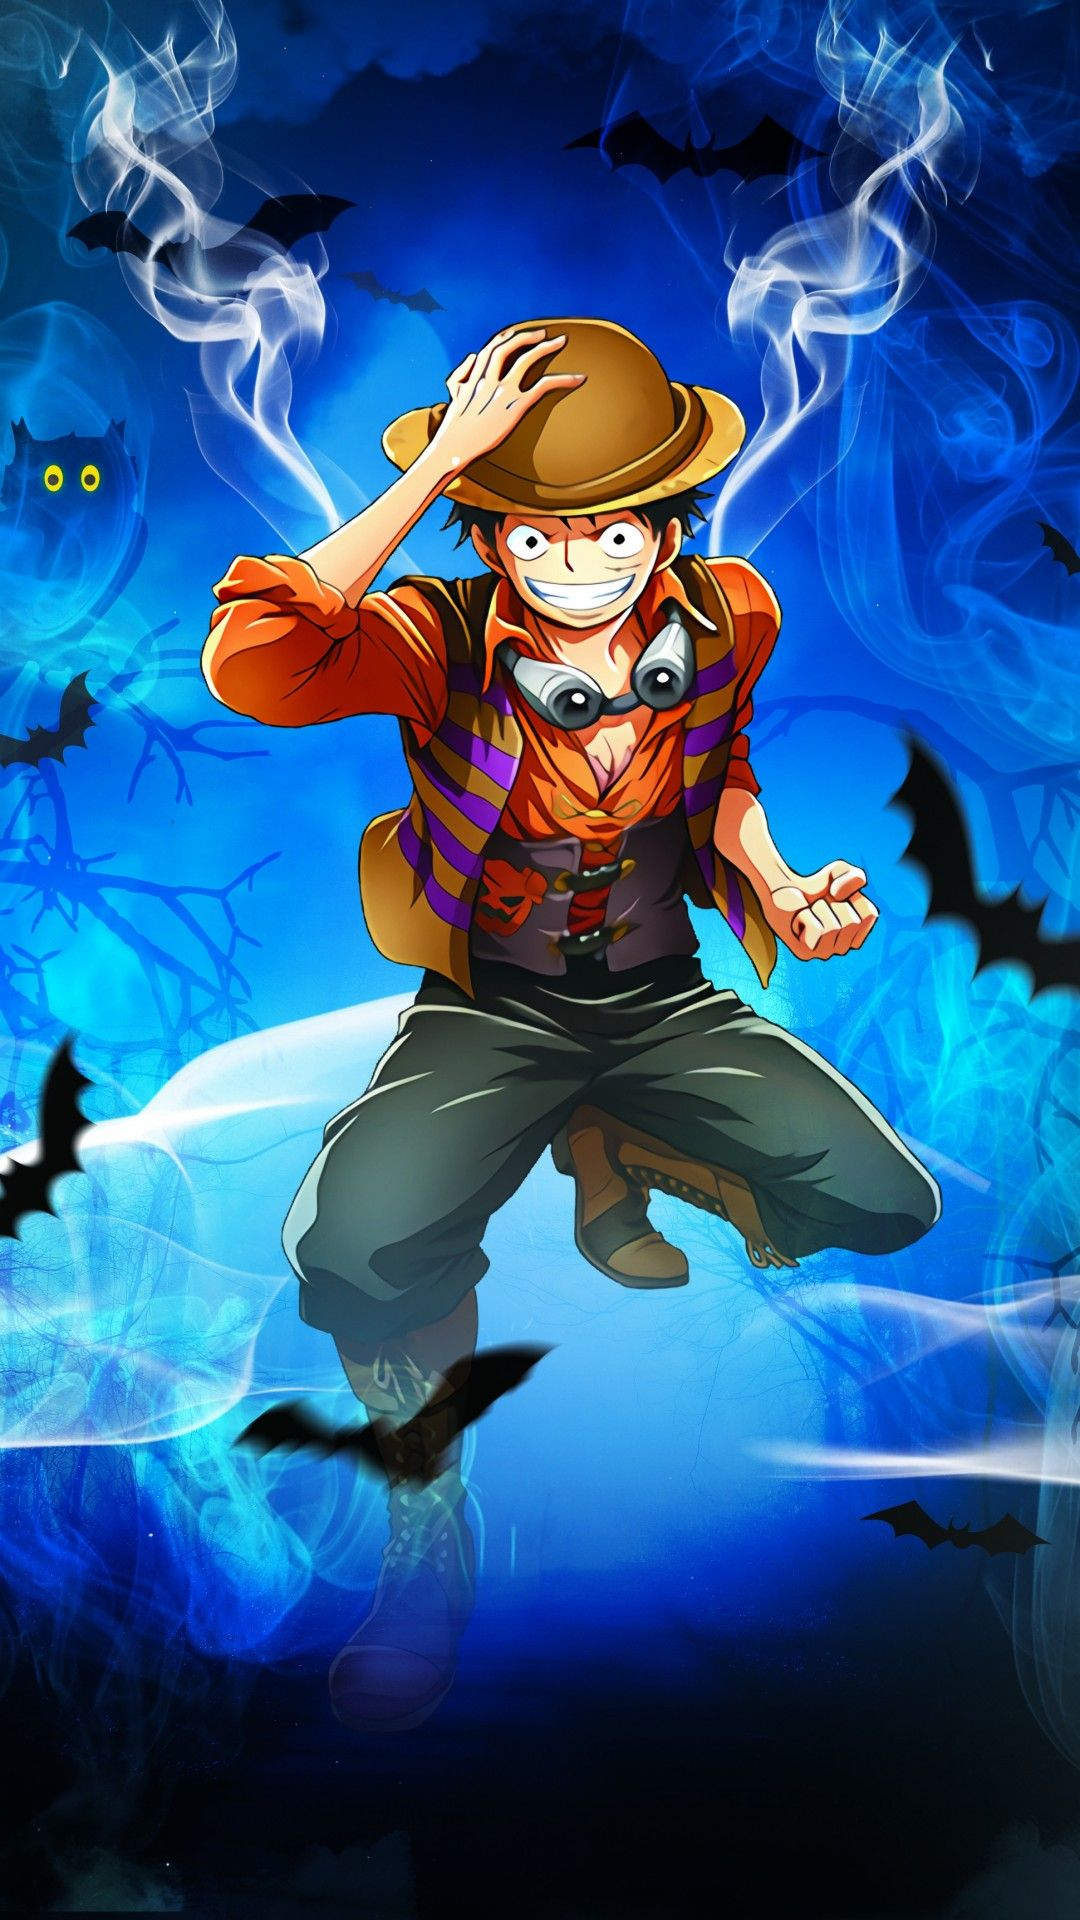 Monkey D Luffy Straw Hat Pirates One Piece Smiling One Piece Images One Piece Manga One Piece Luffy